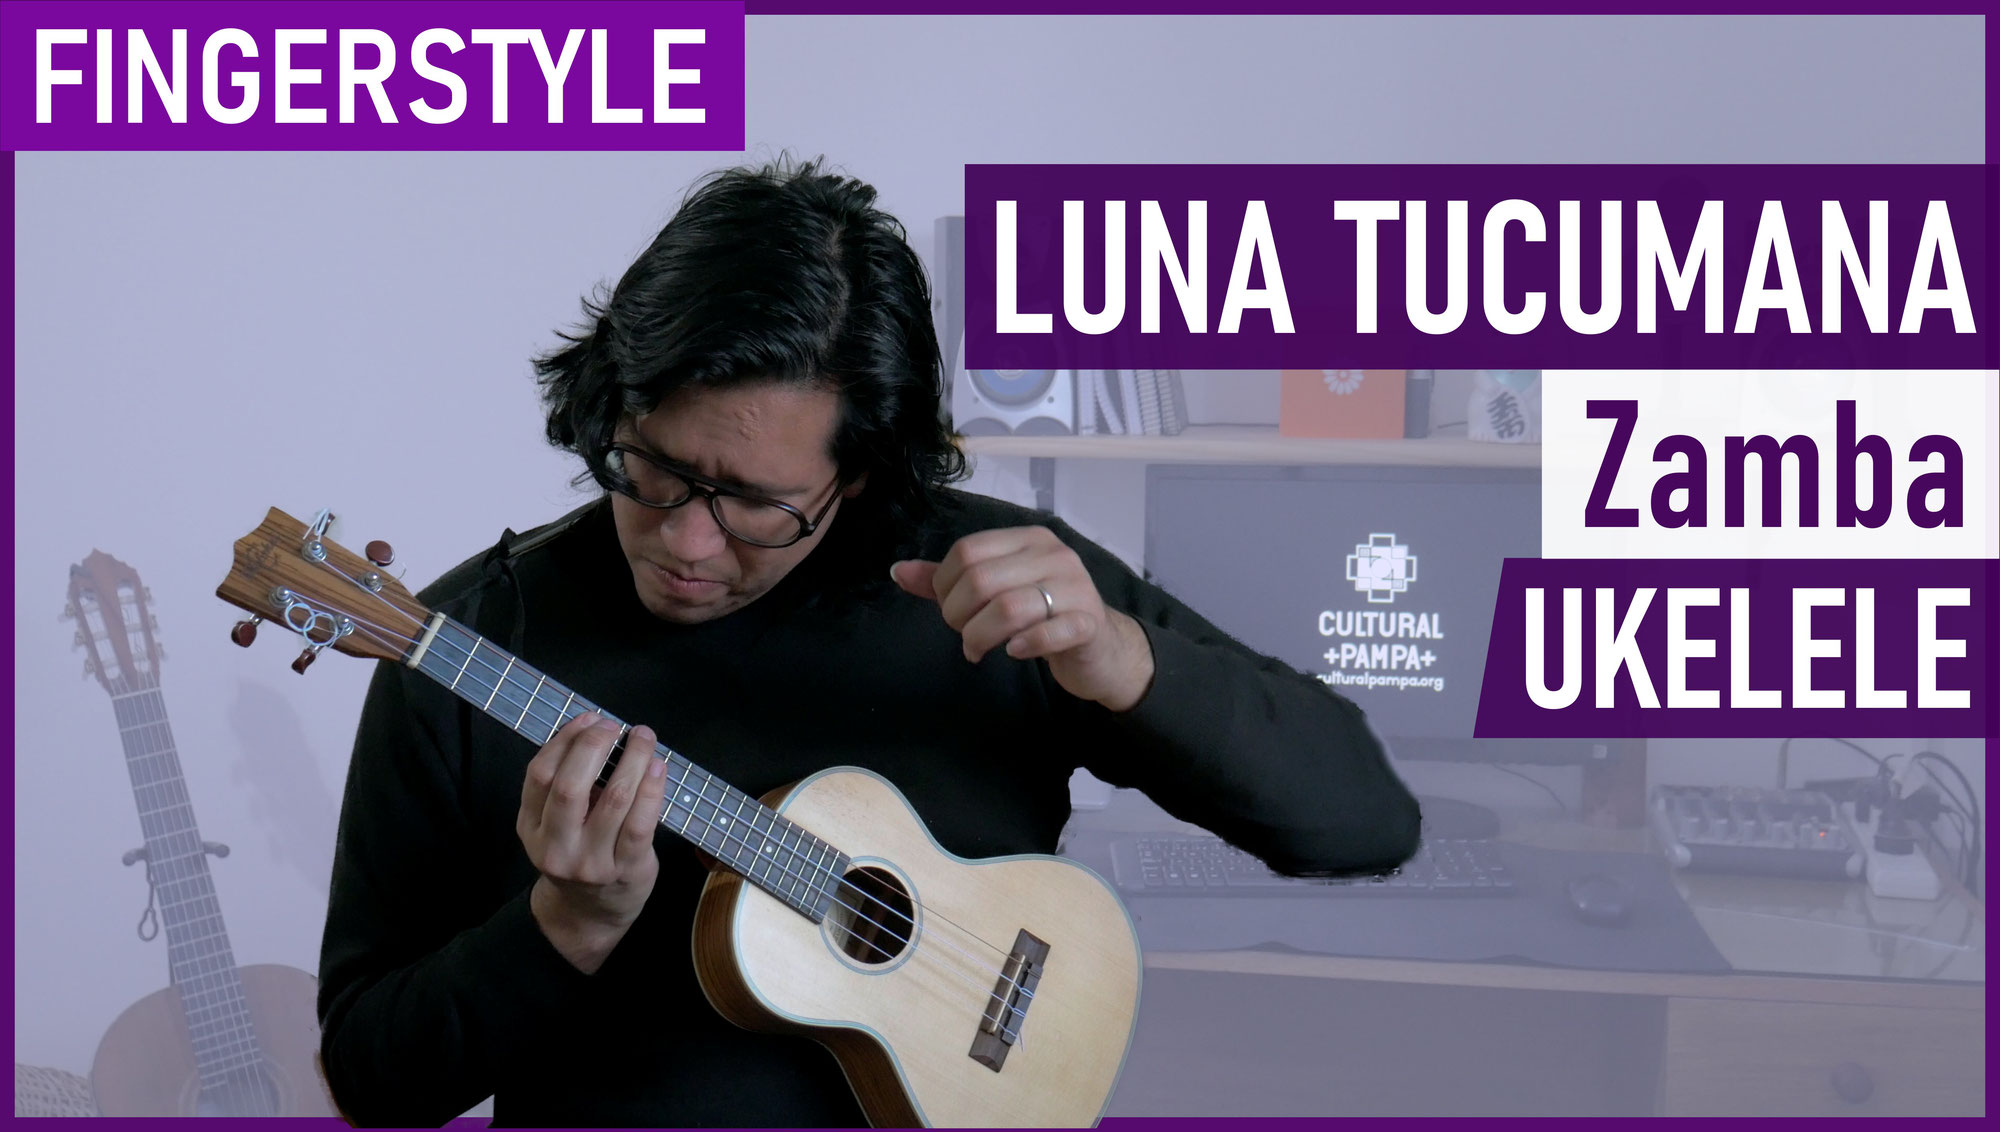 Luna Tucumana (Atahualpa Yupanqui) | Ukelele FINGERSTYLE Cover